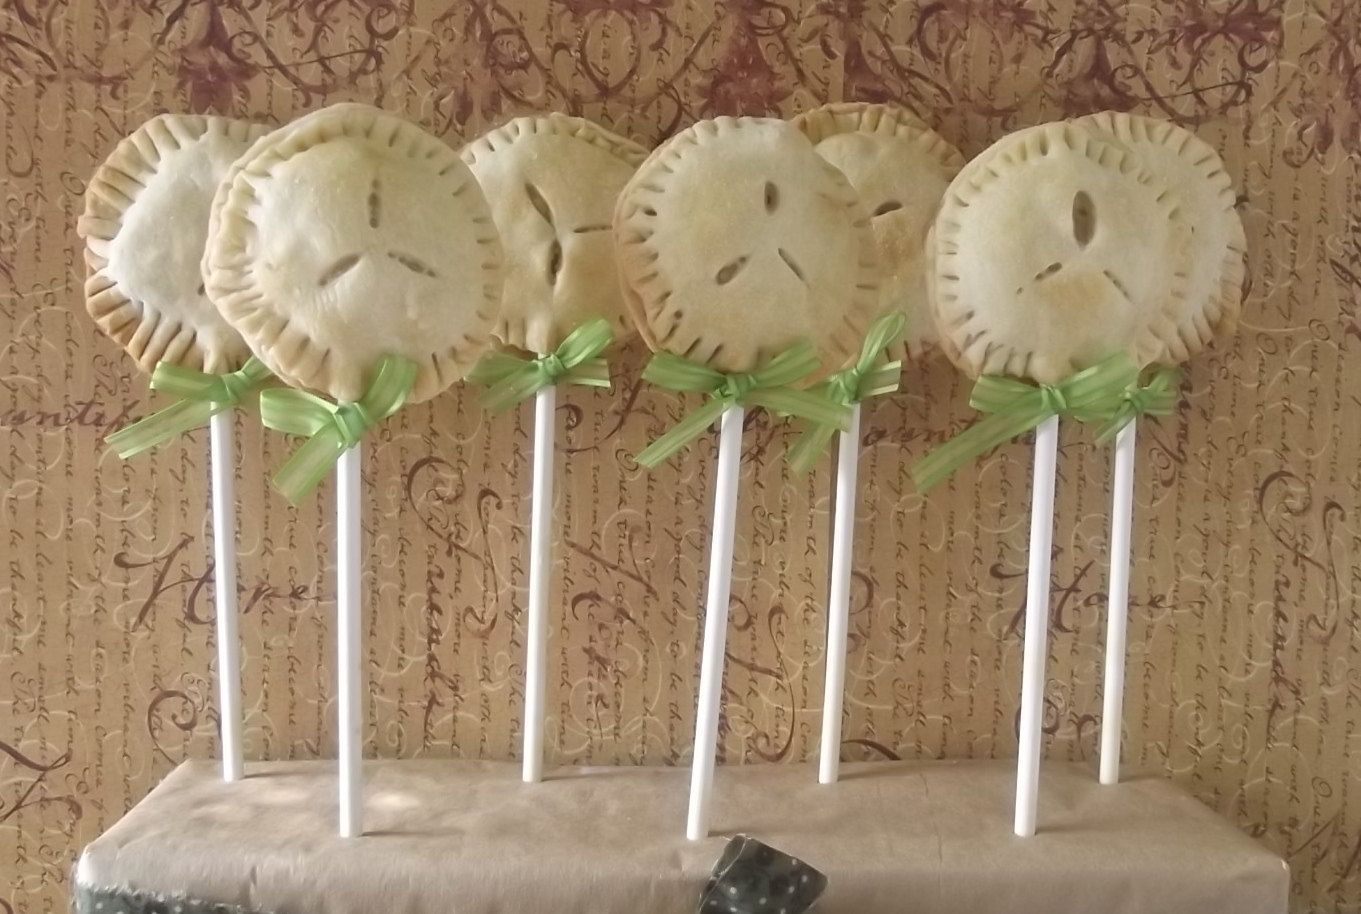 Apple Pie Pops by SweetSetups on Etsy